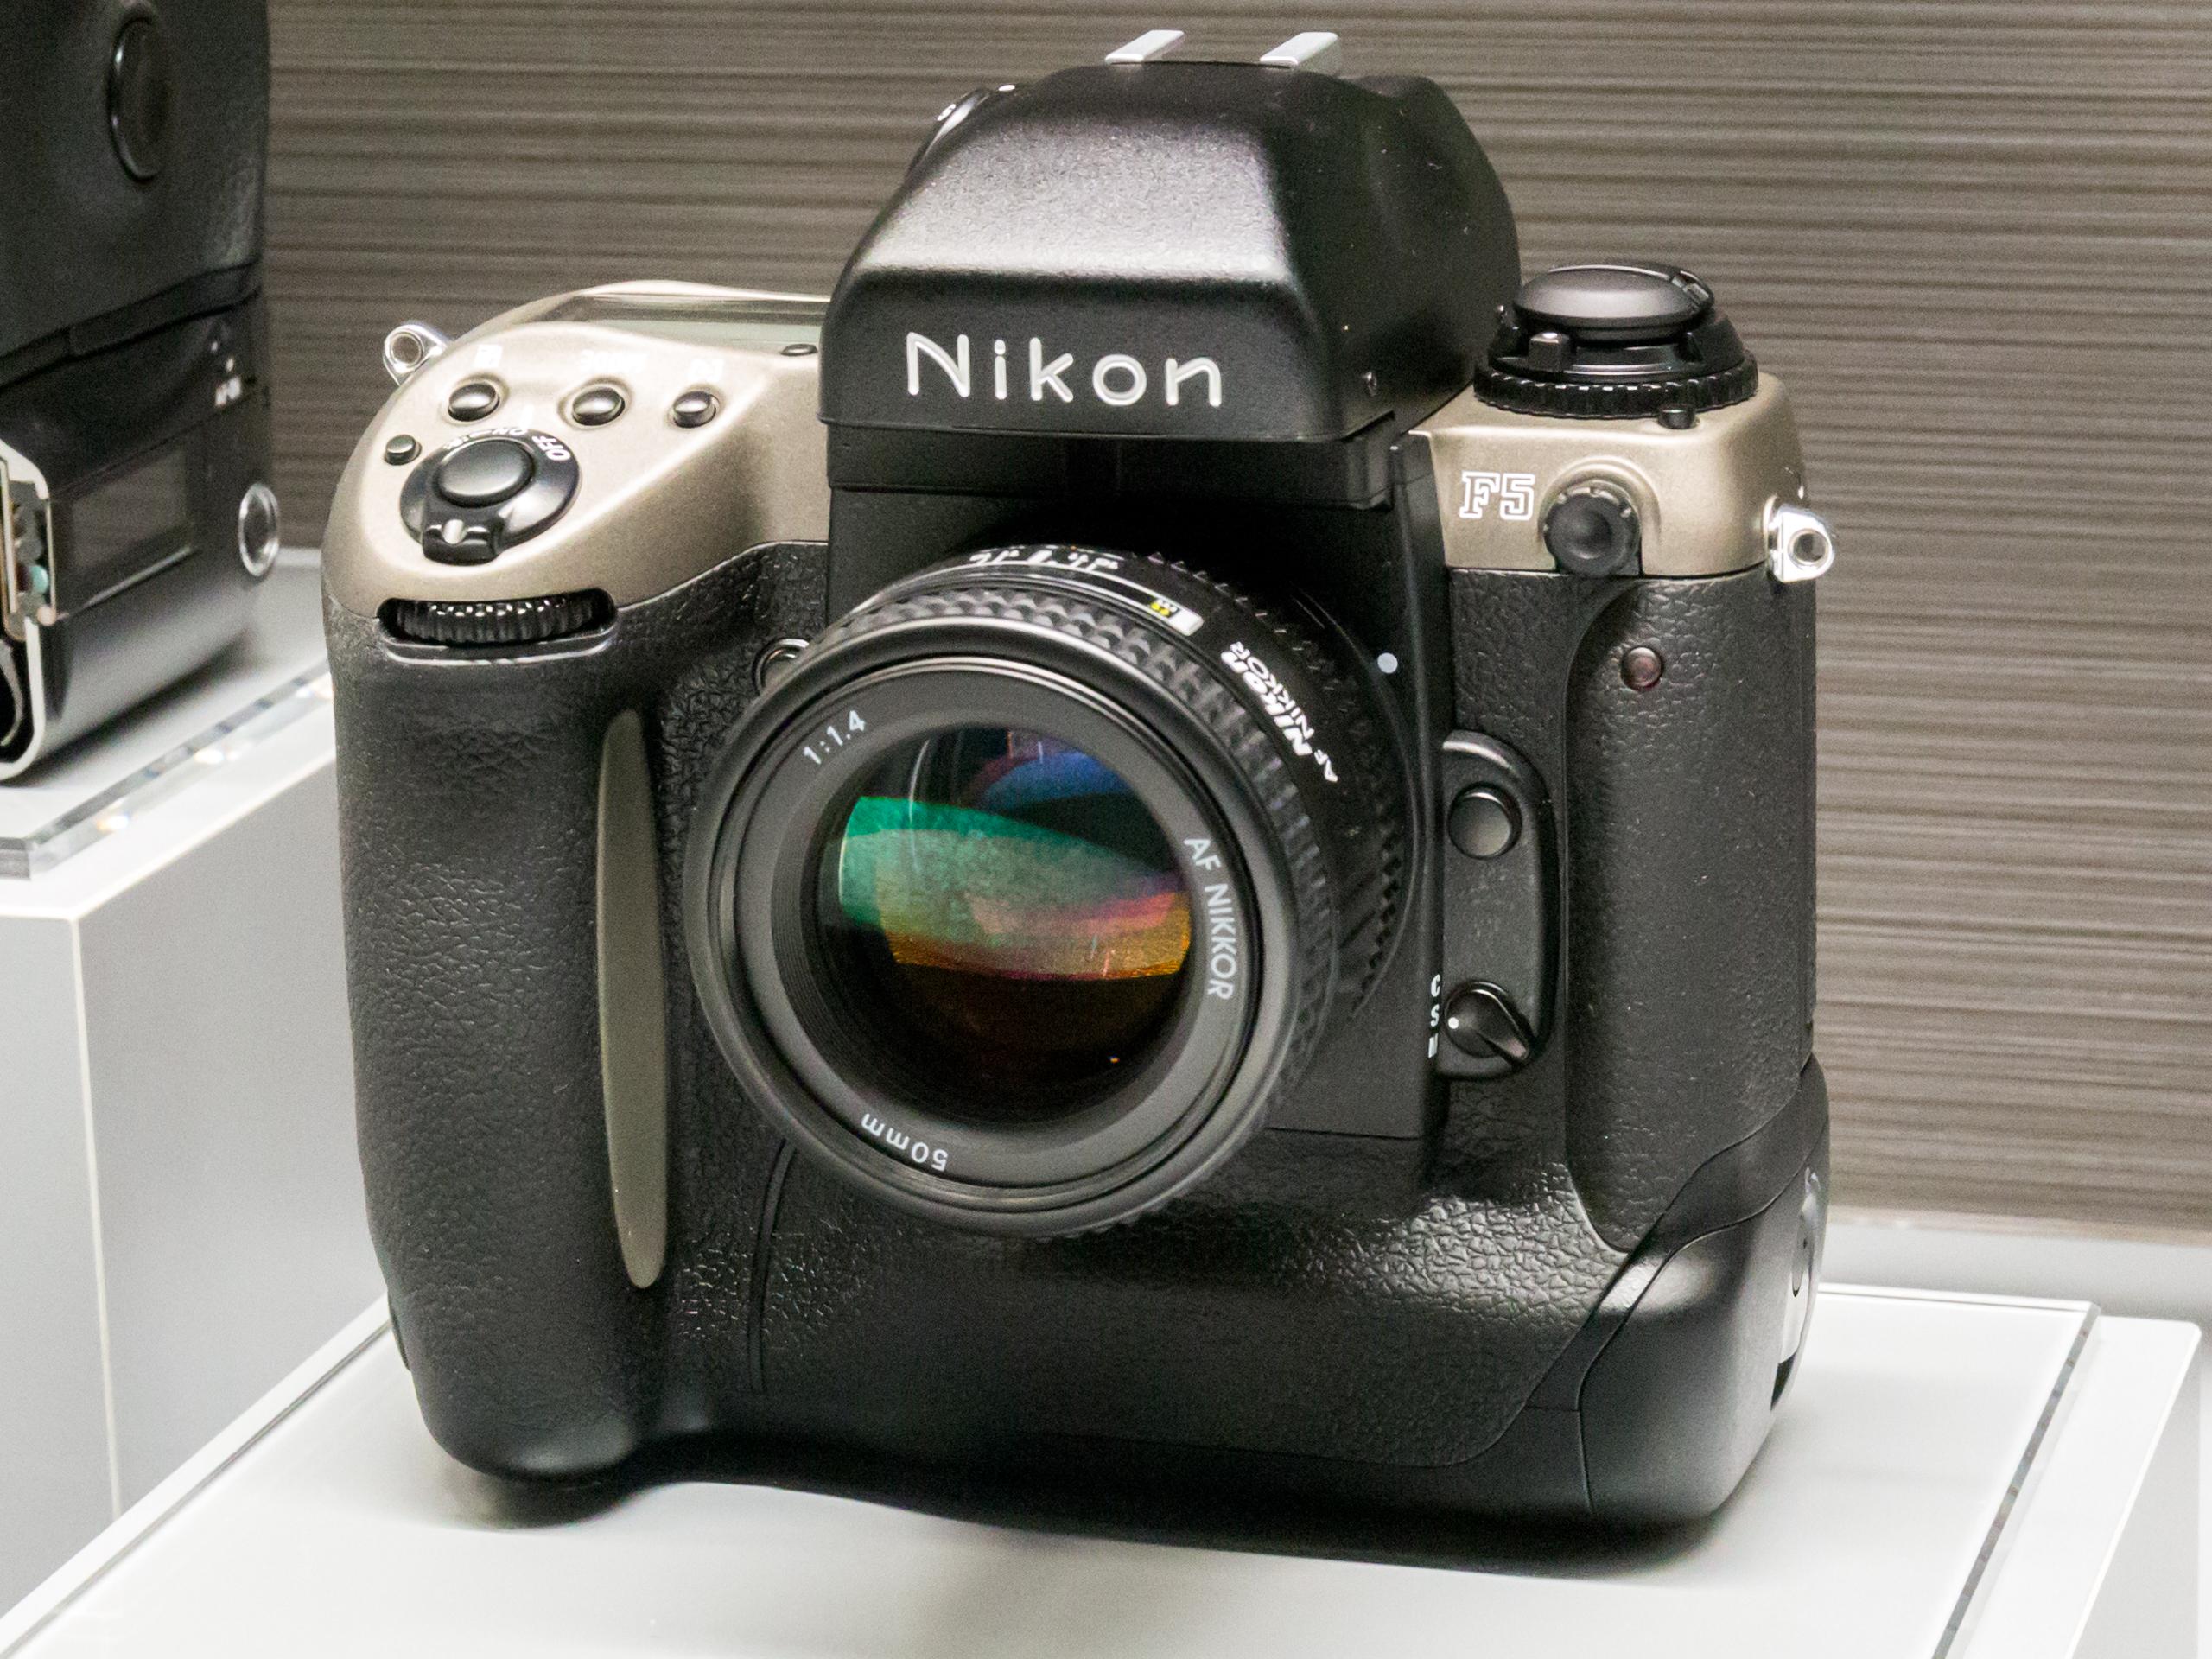 https://upload.wikimedia.org/wikipedia/commons/2/2b/Nikon_F5_50th_Anniversary_model_2015_Nikon_Museum.jpg